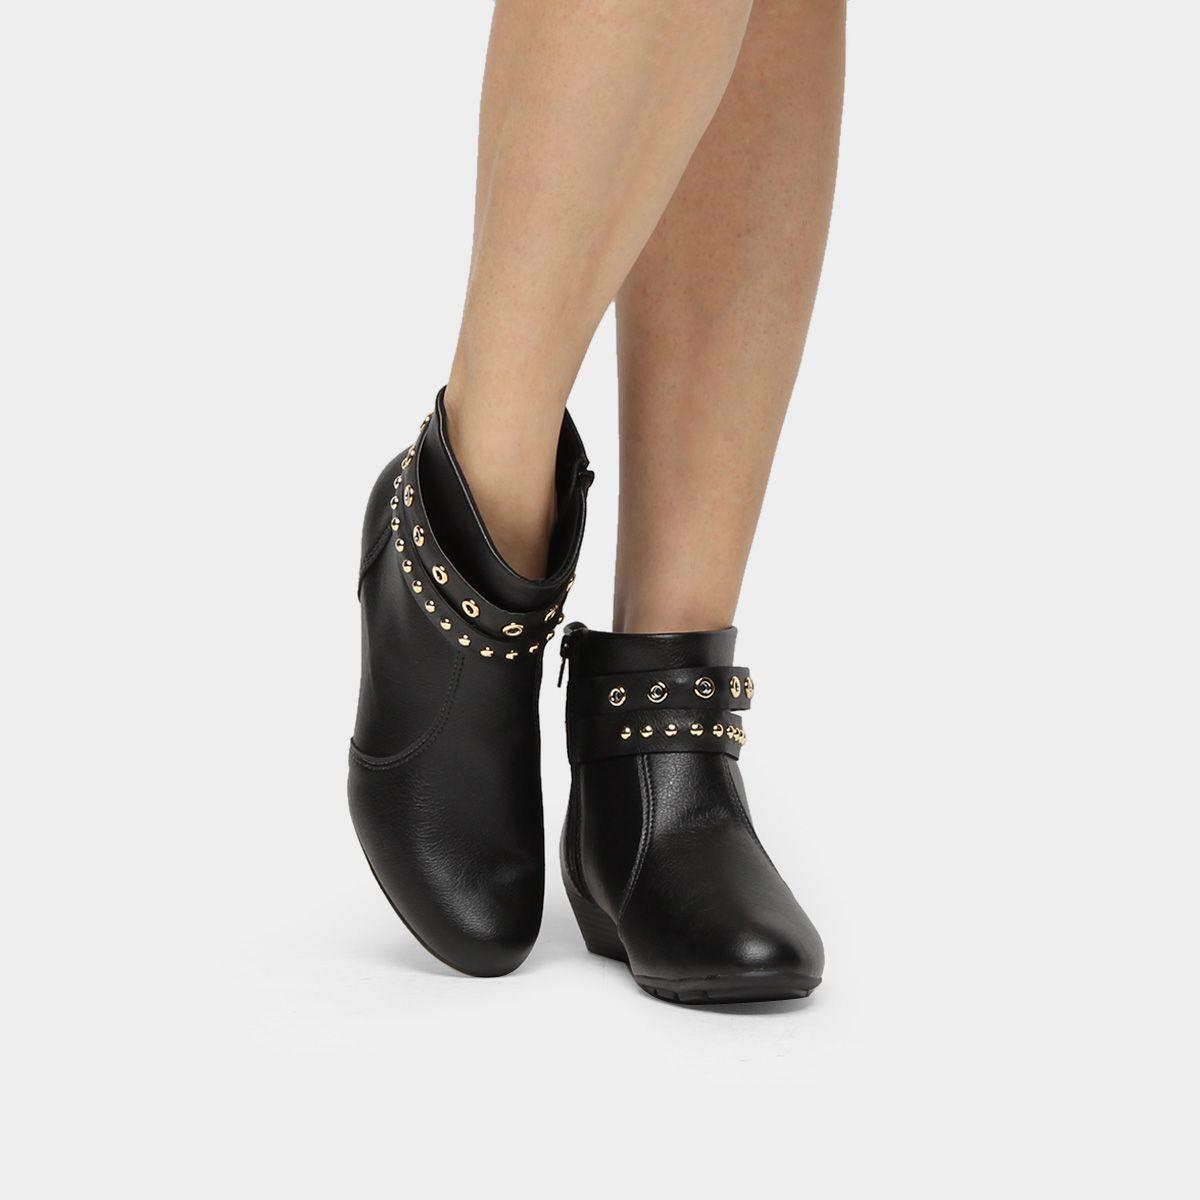 33e1764aa Compre Bota Modare Anabela Multi Tiras Preto na Zattini a nova loja de moda  online da